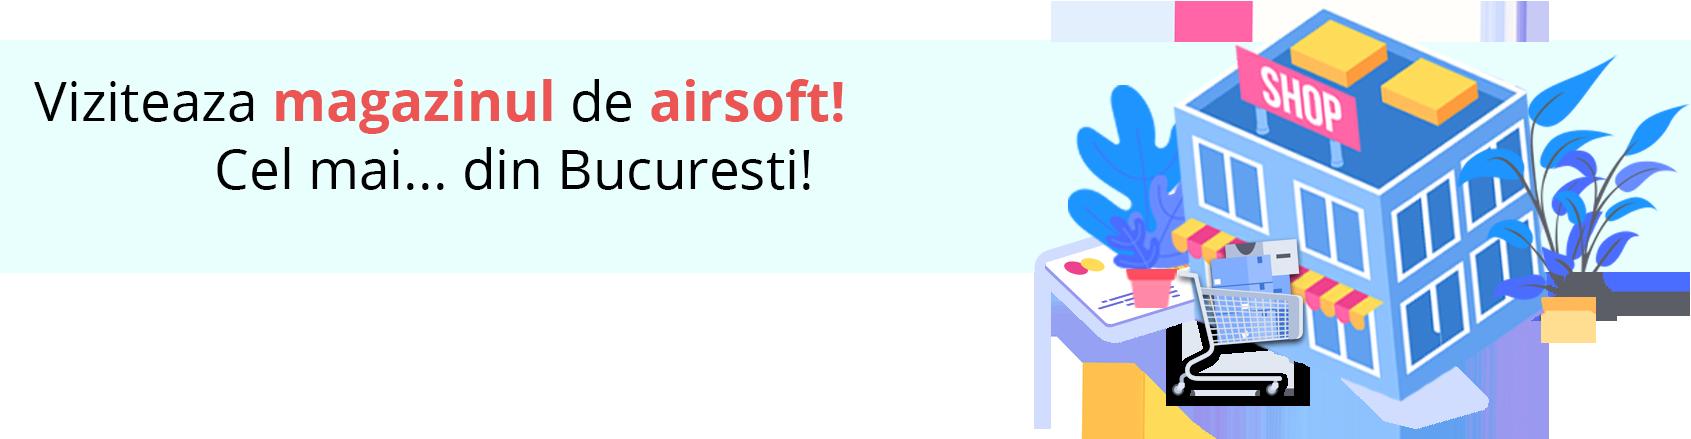 Magazin Airsoft Bucuresti